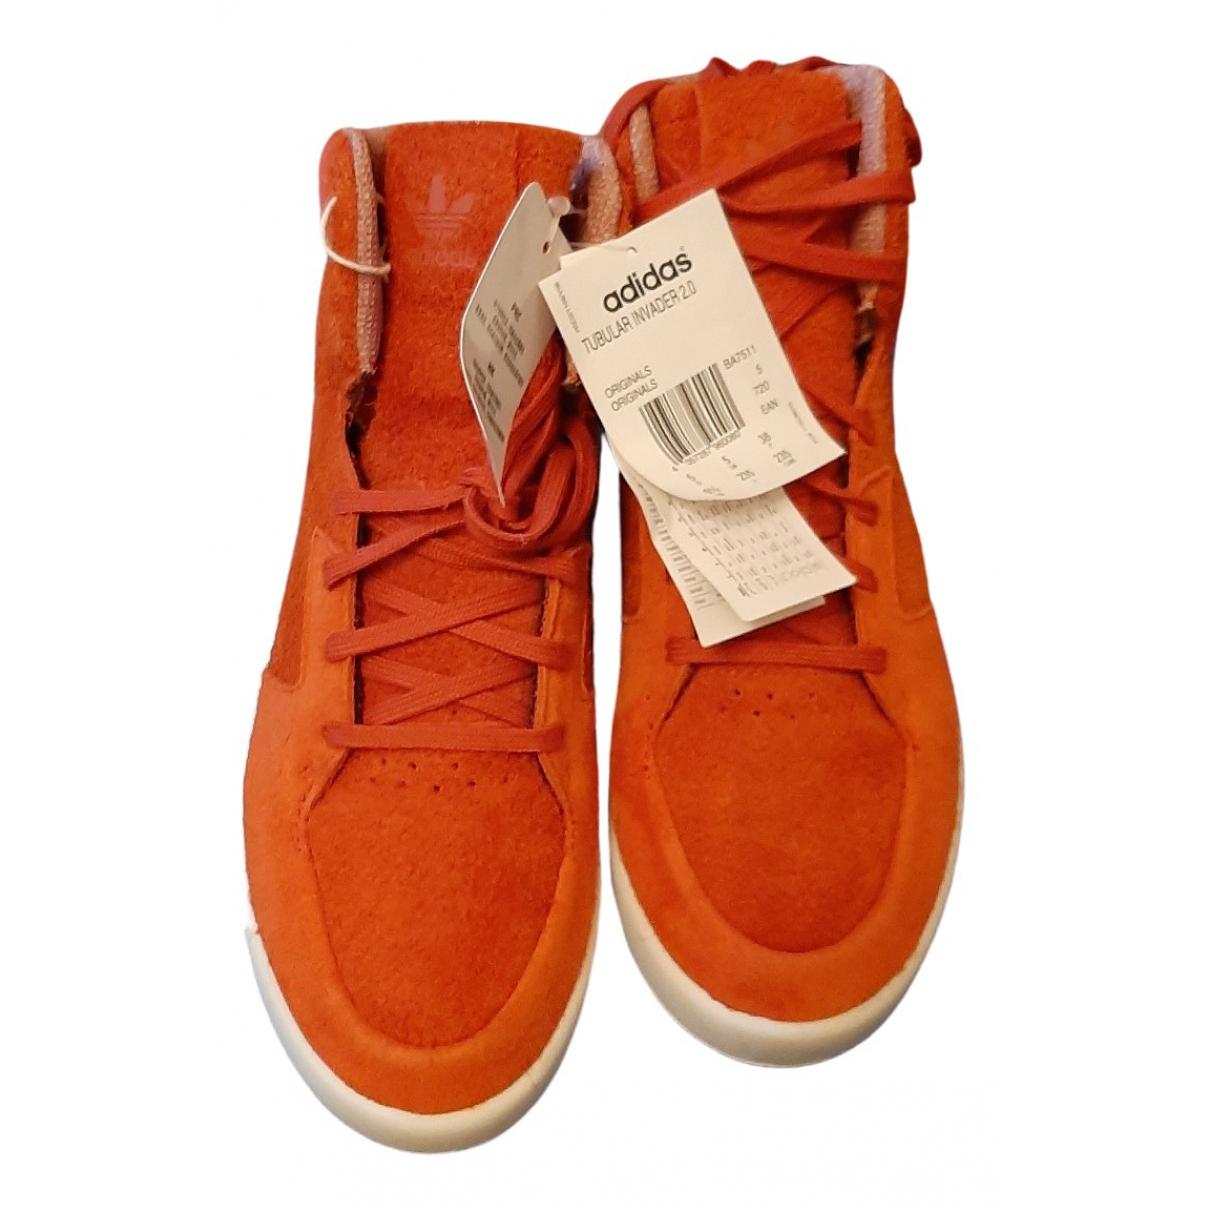 Adidas Tubular Orange Suede Trainers for Women 38 EU